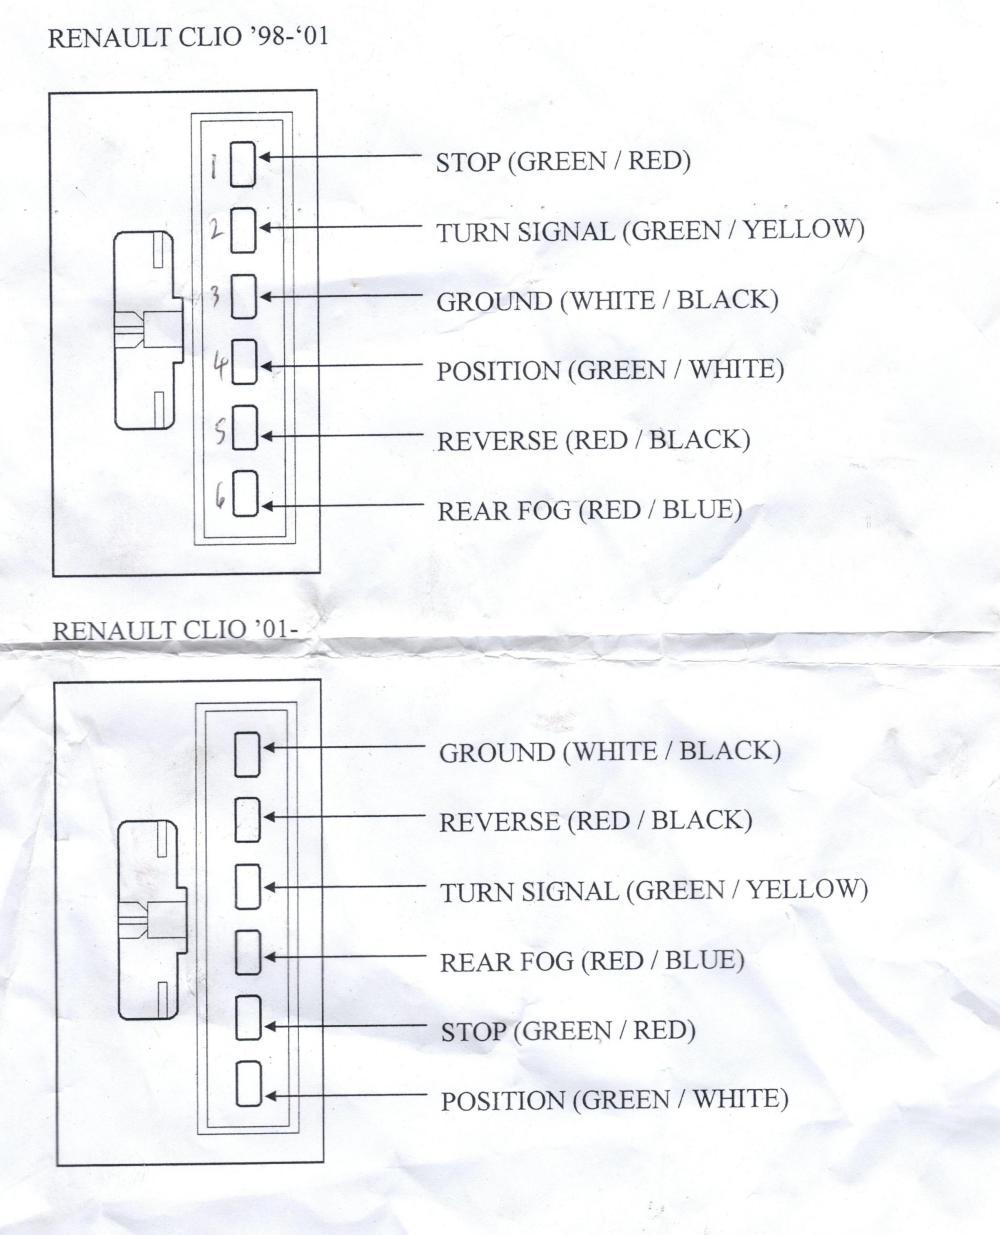 medium resolution of renault clio window wiring diagram wiring library rh 5 budoshop4you de renault clio 1998 renault clio 2 wiring diagram pdf